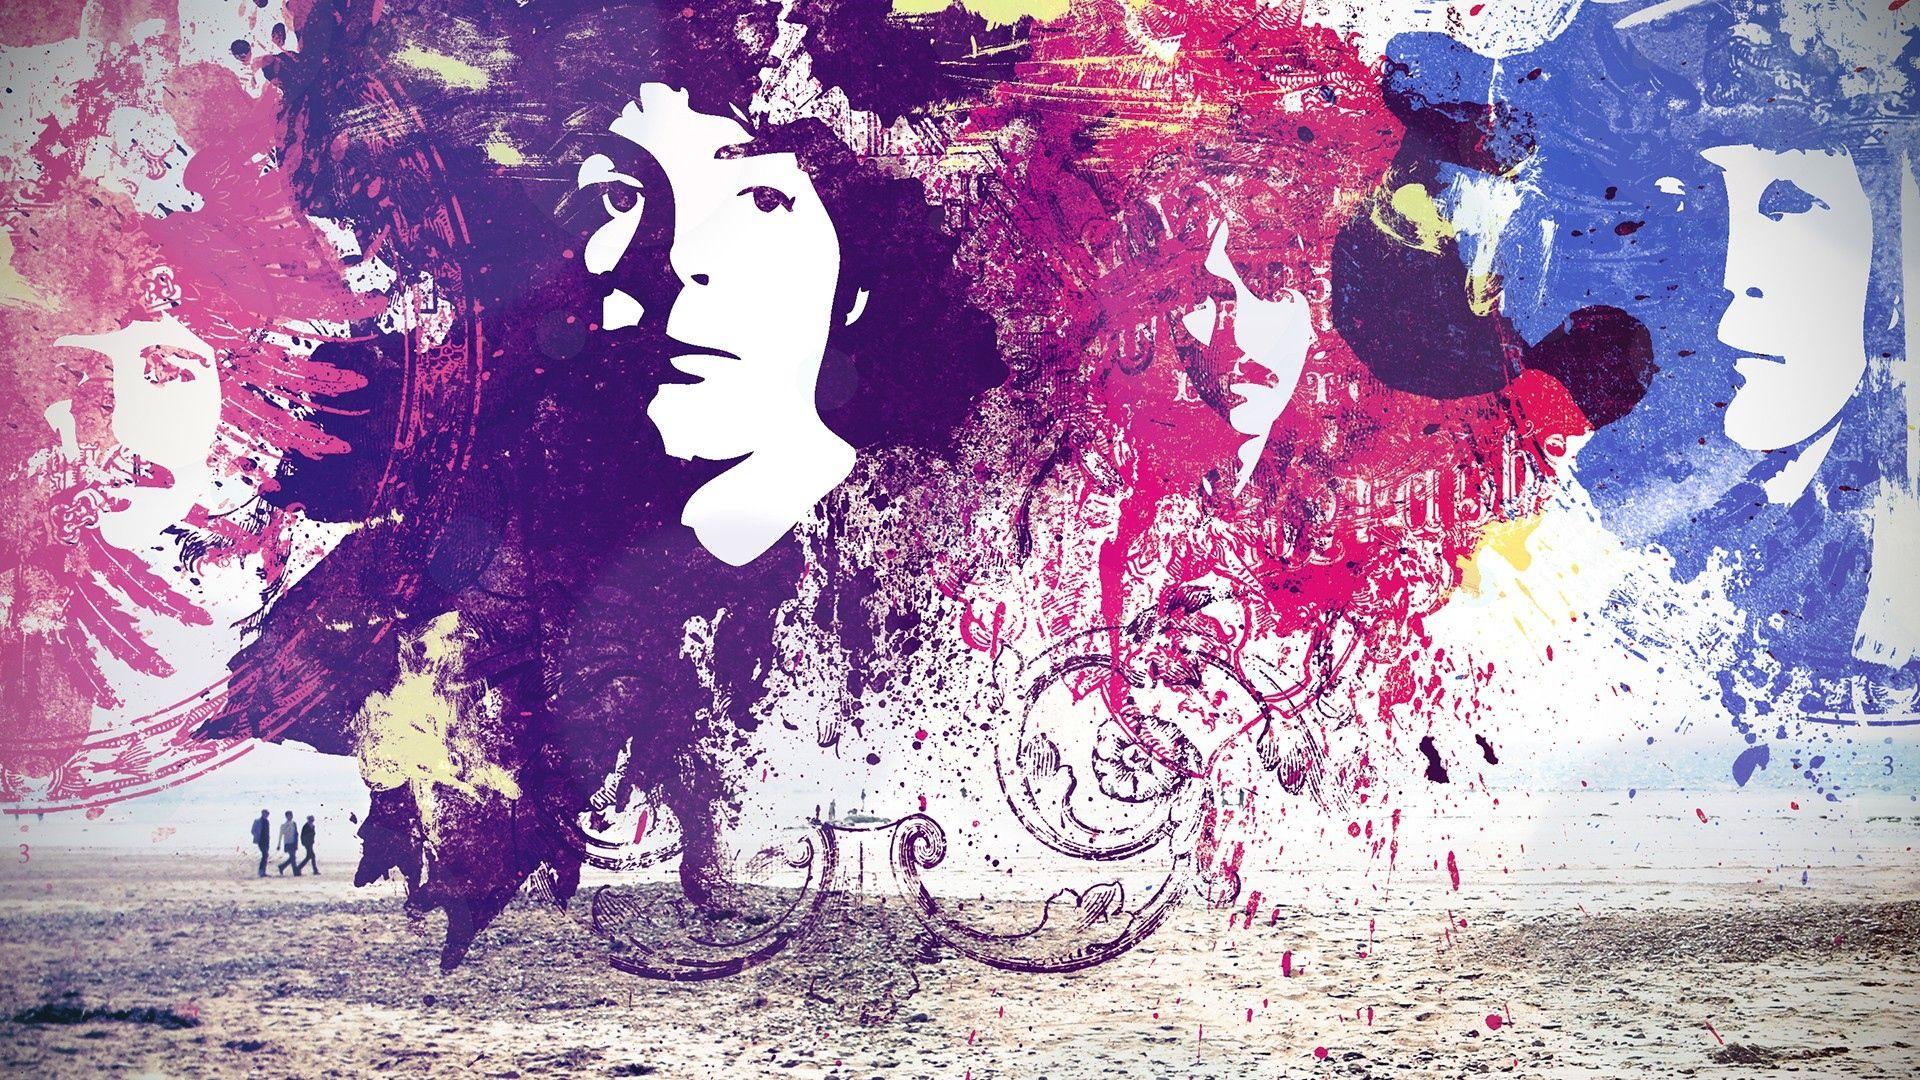 Best Wallpaper Logo The Beatles - 66c106477189f1fb1ae9b4da9d3017d0  HD_331129.jpg